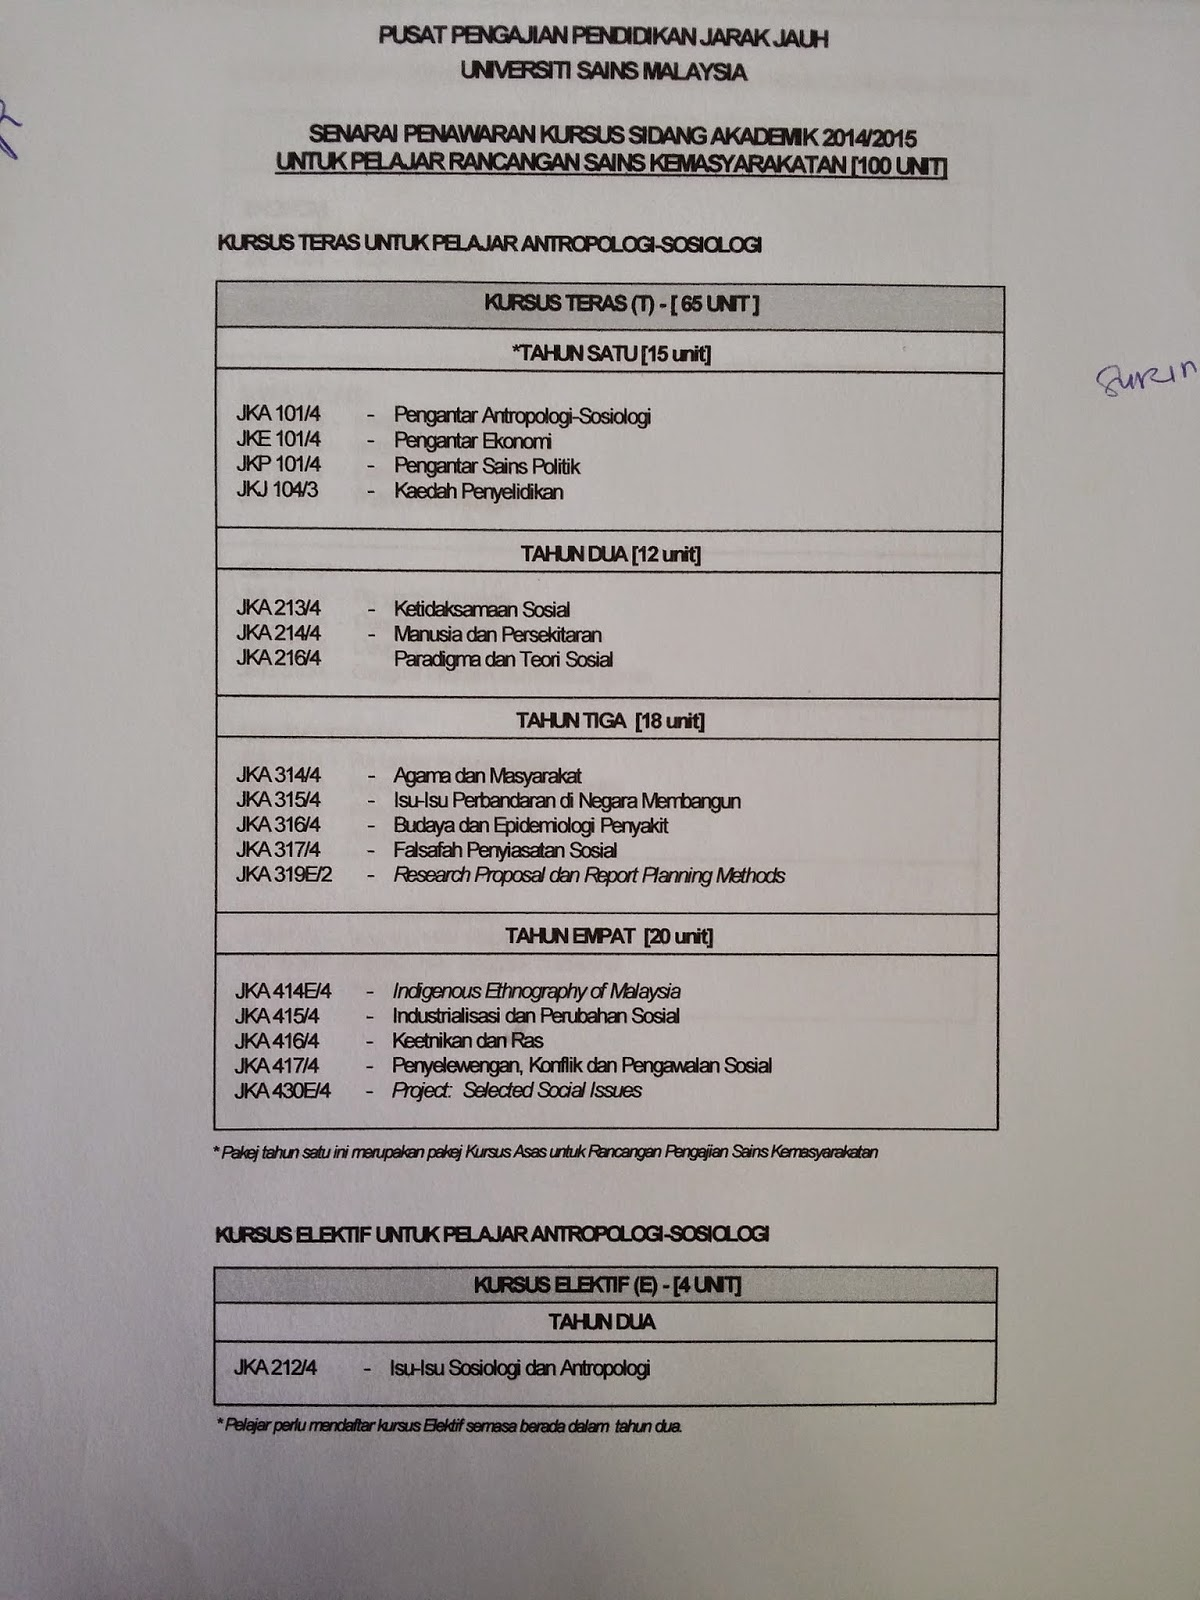 cara daftar kursus pjj usm, daftar minor major, minor pjj usm, daftar kursus tahun dua, daftar kursus tahun tiga, pjj usm, info pjj usm